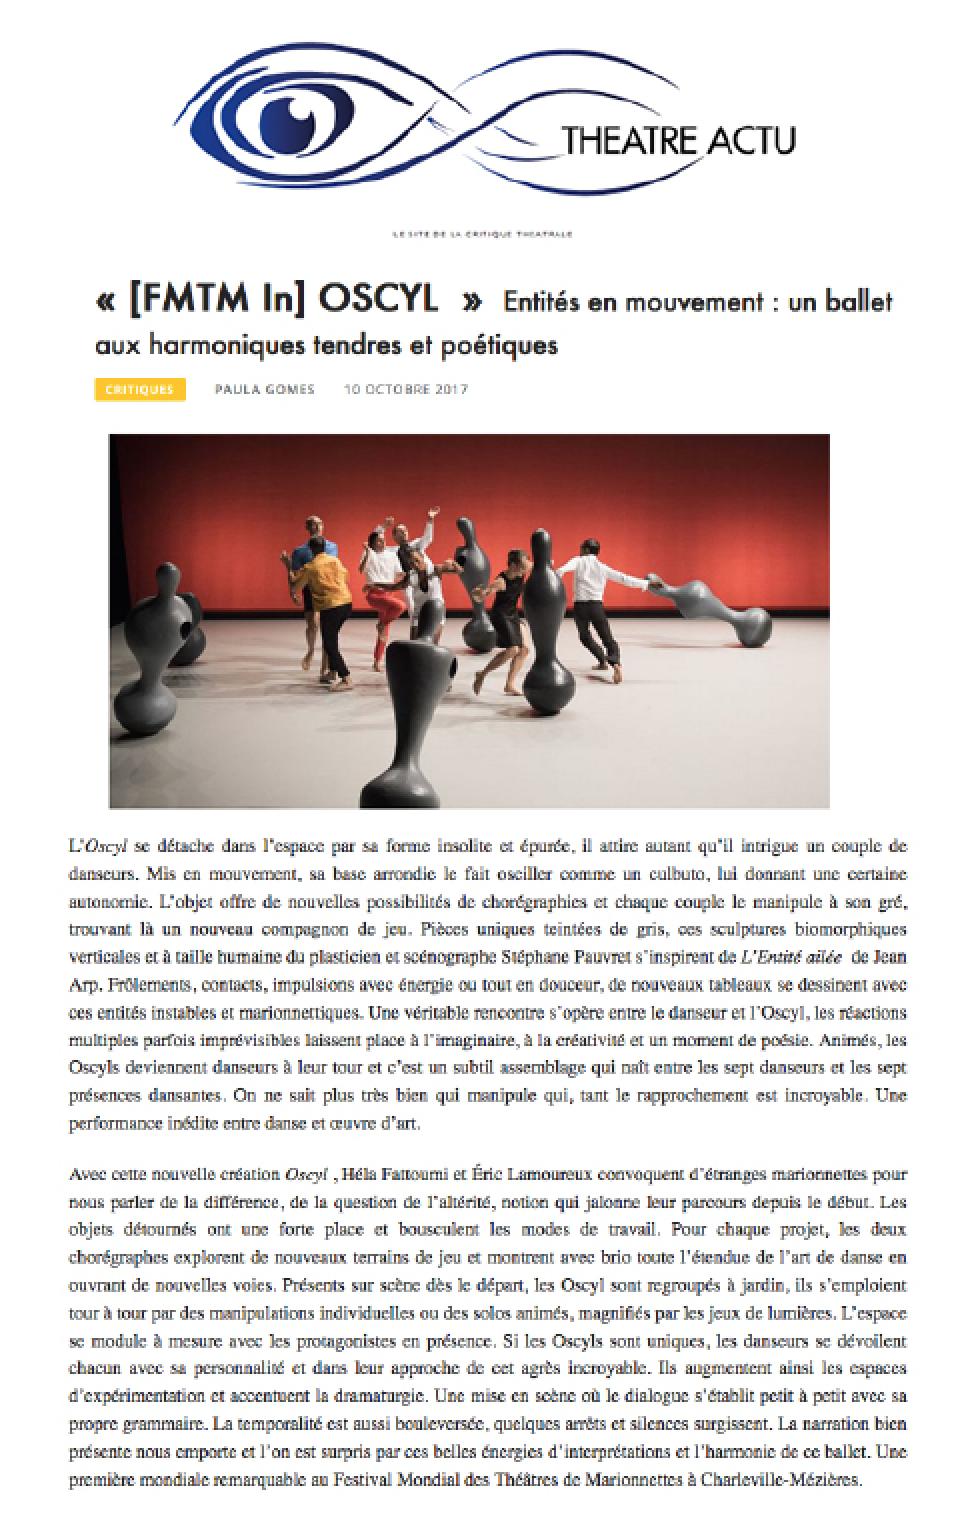 Theatre actu OSCYL bloc